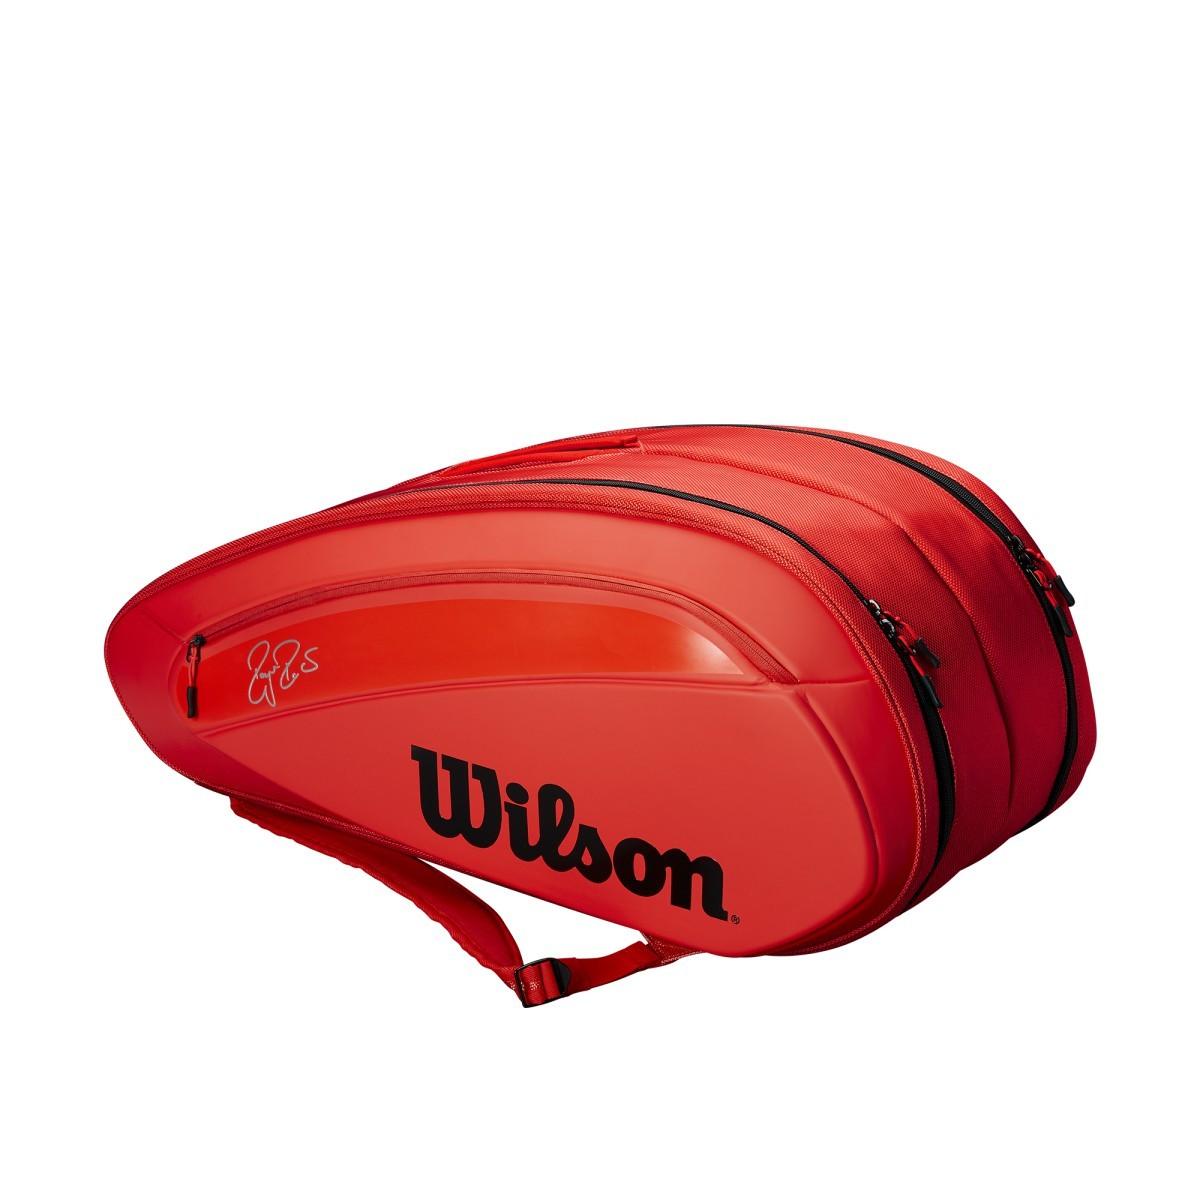 Wilson Federert Tennis Bag DNA 12 Red ラケットホルダー / ラケットバック / テニスバッグ